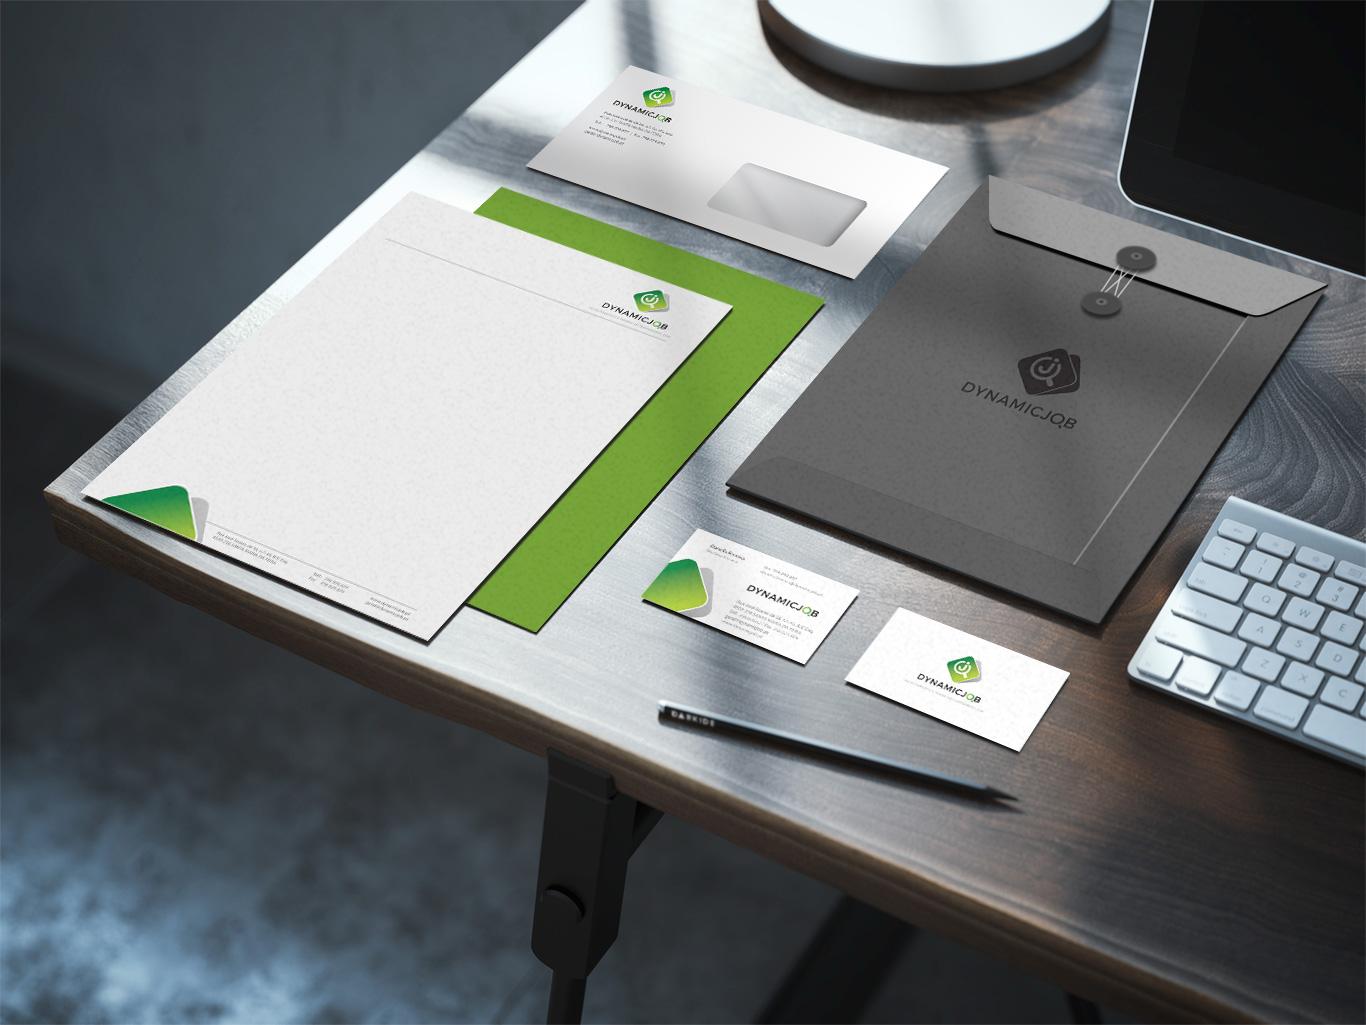 dynamicjob-office